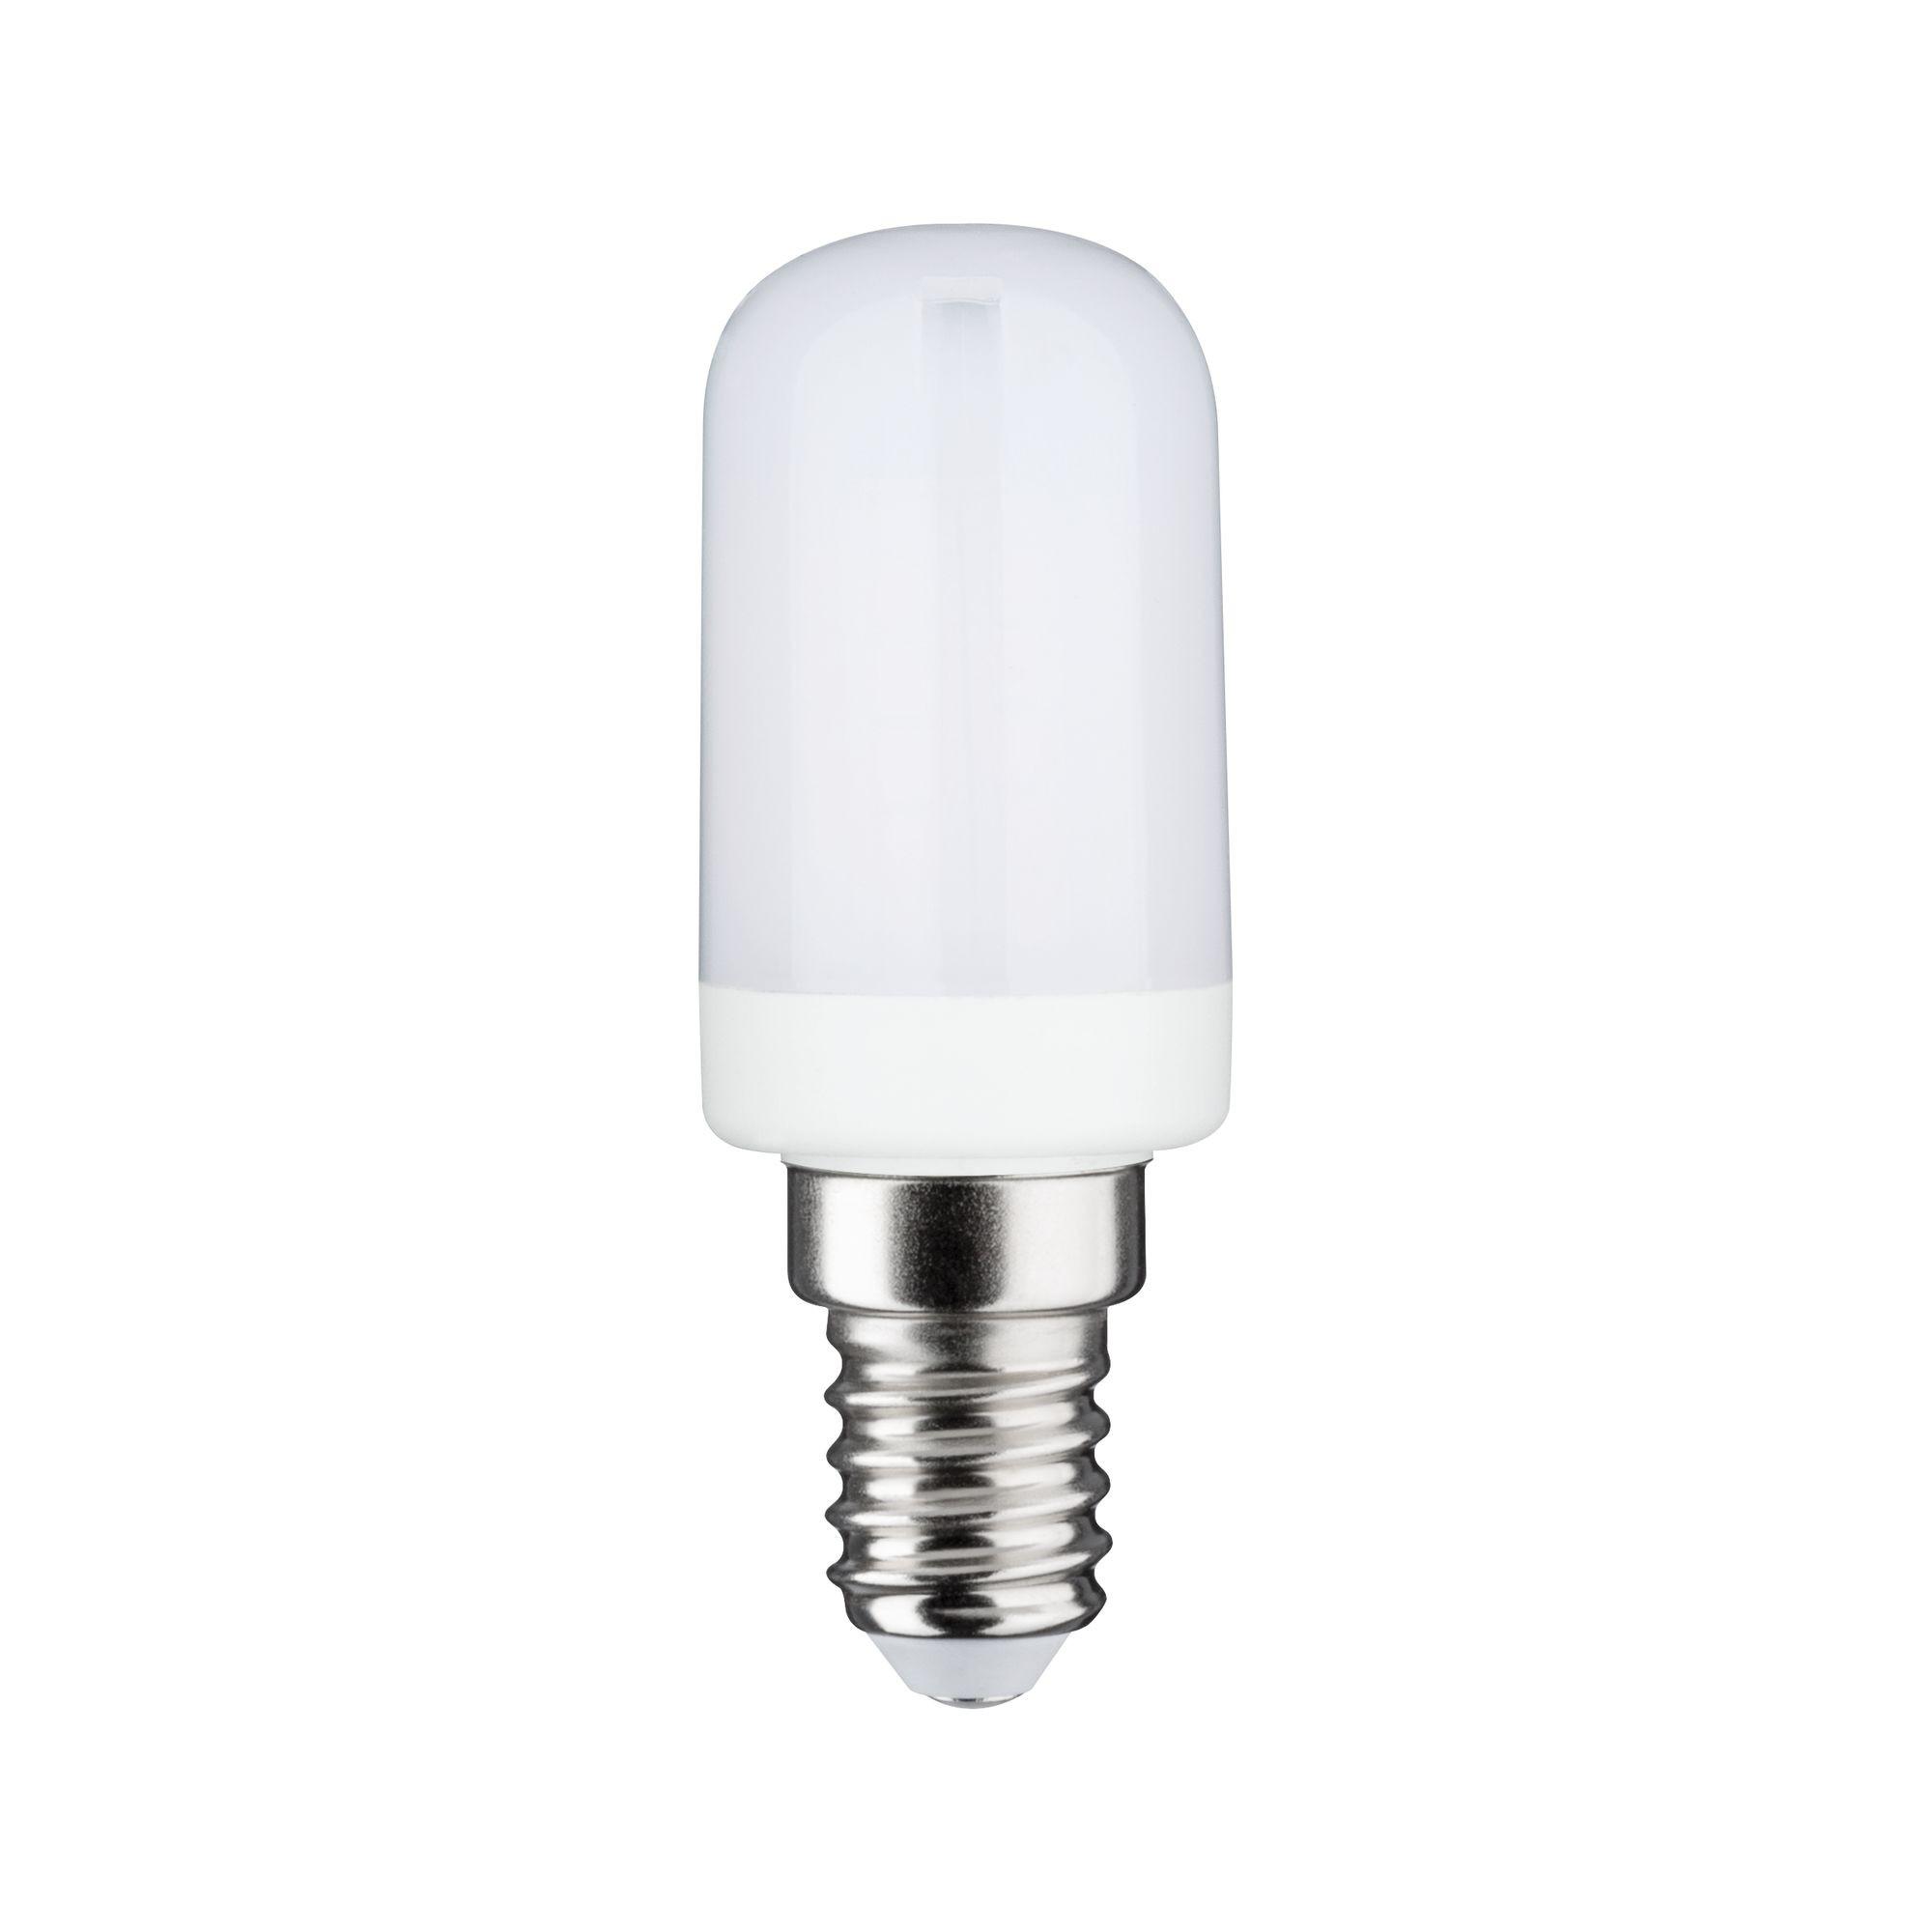 Светодиодная лампочка Paulmann 28357 E14 250 Лм 3 Вт